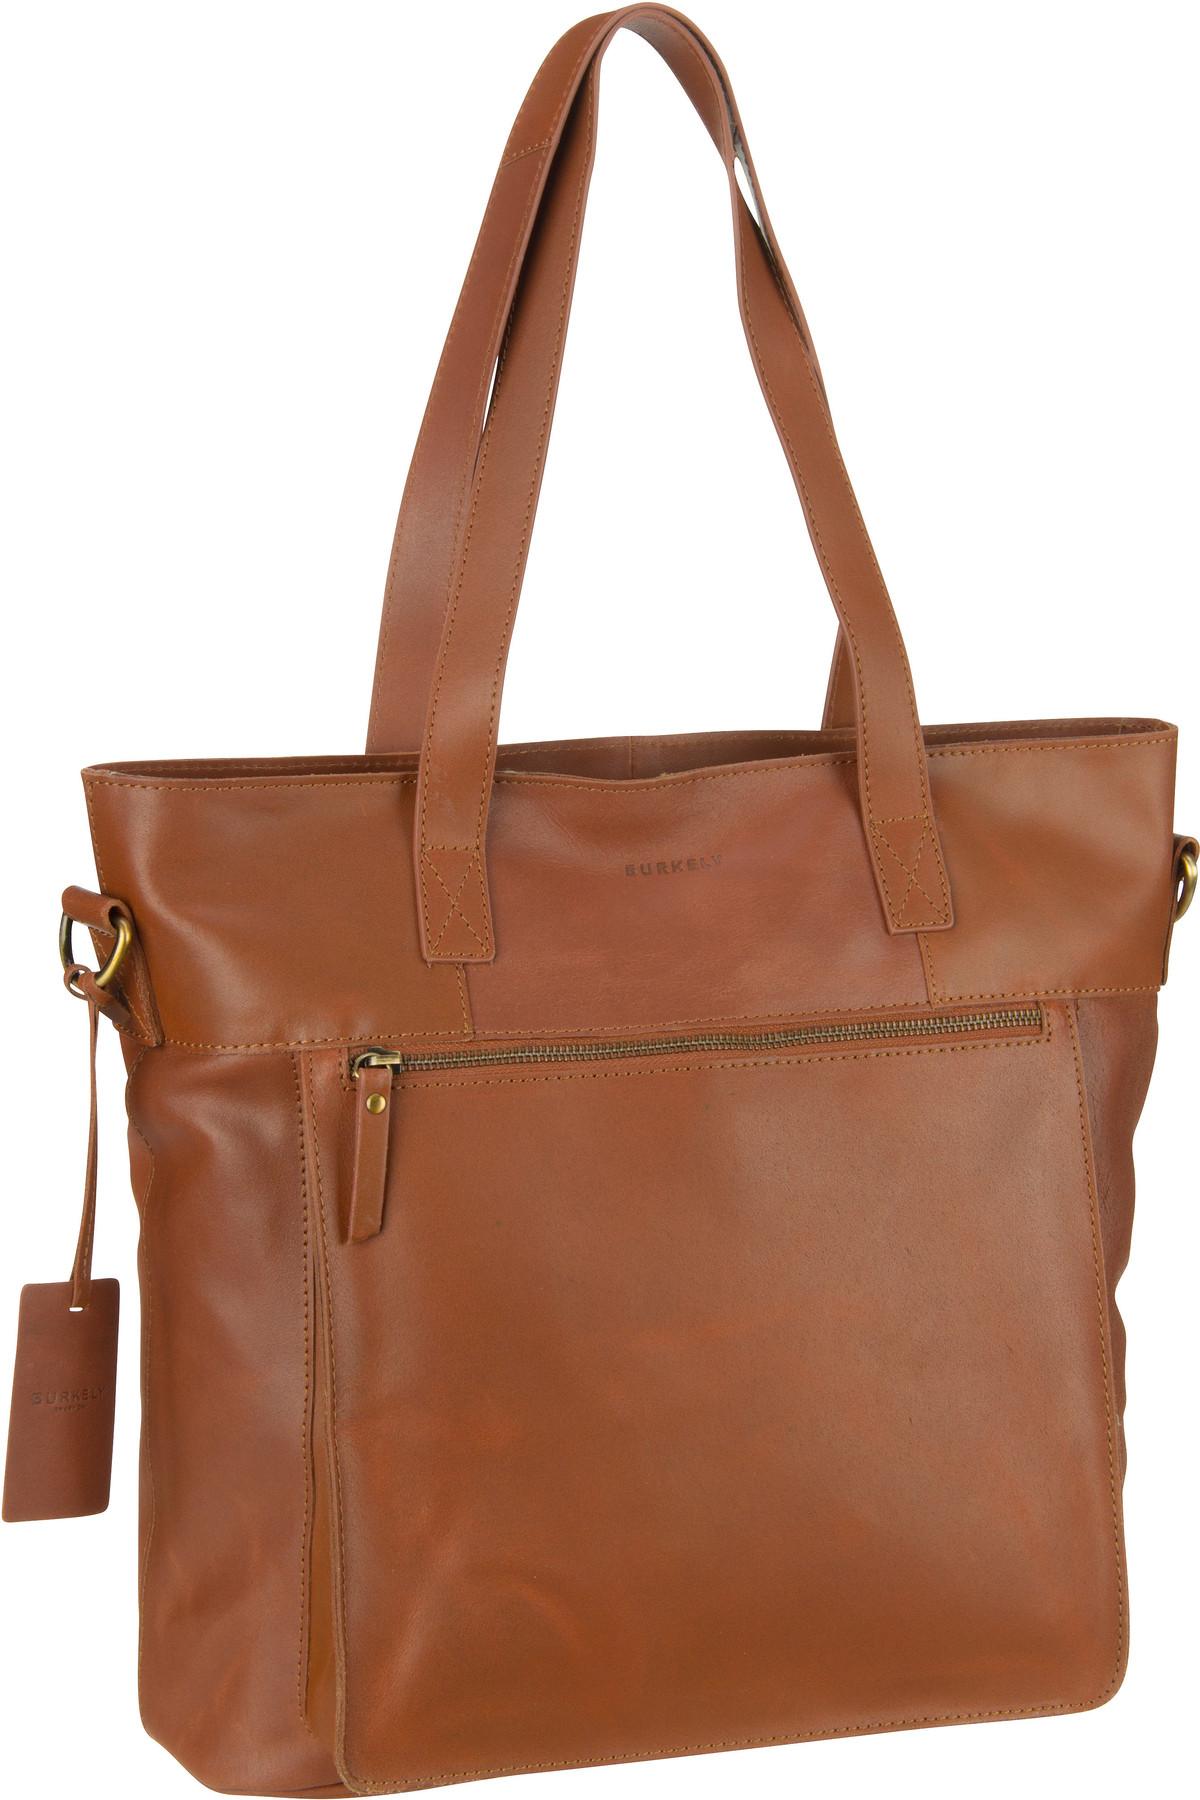 burkely -  Handtasche Vintage Jade Shopper 7003 Cognac